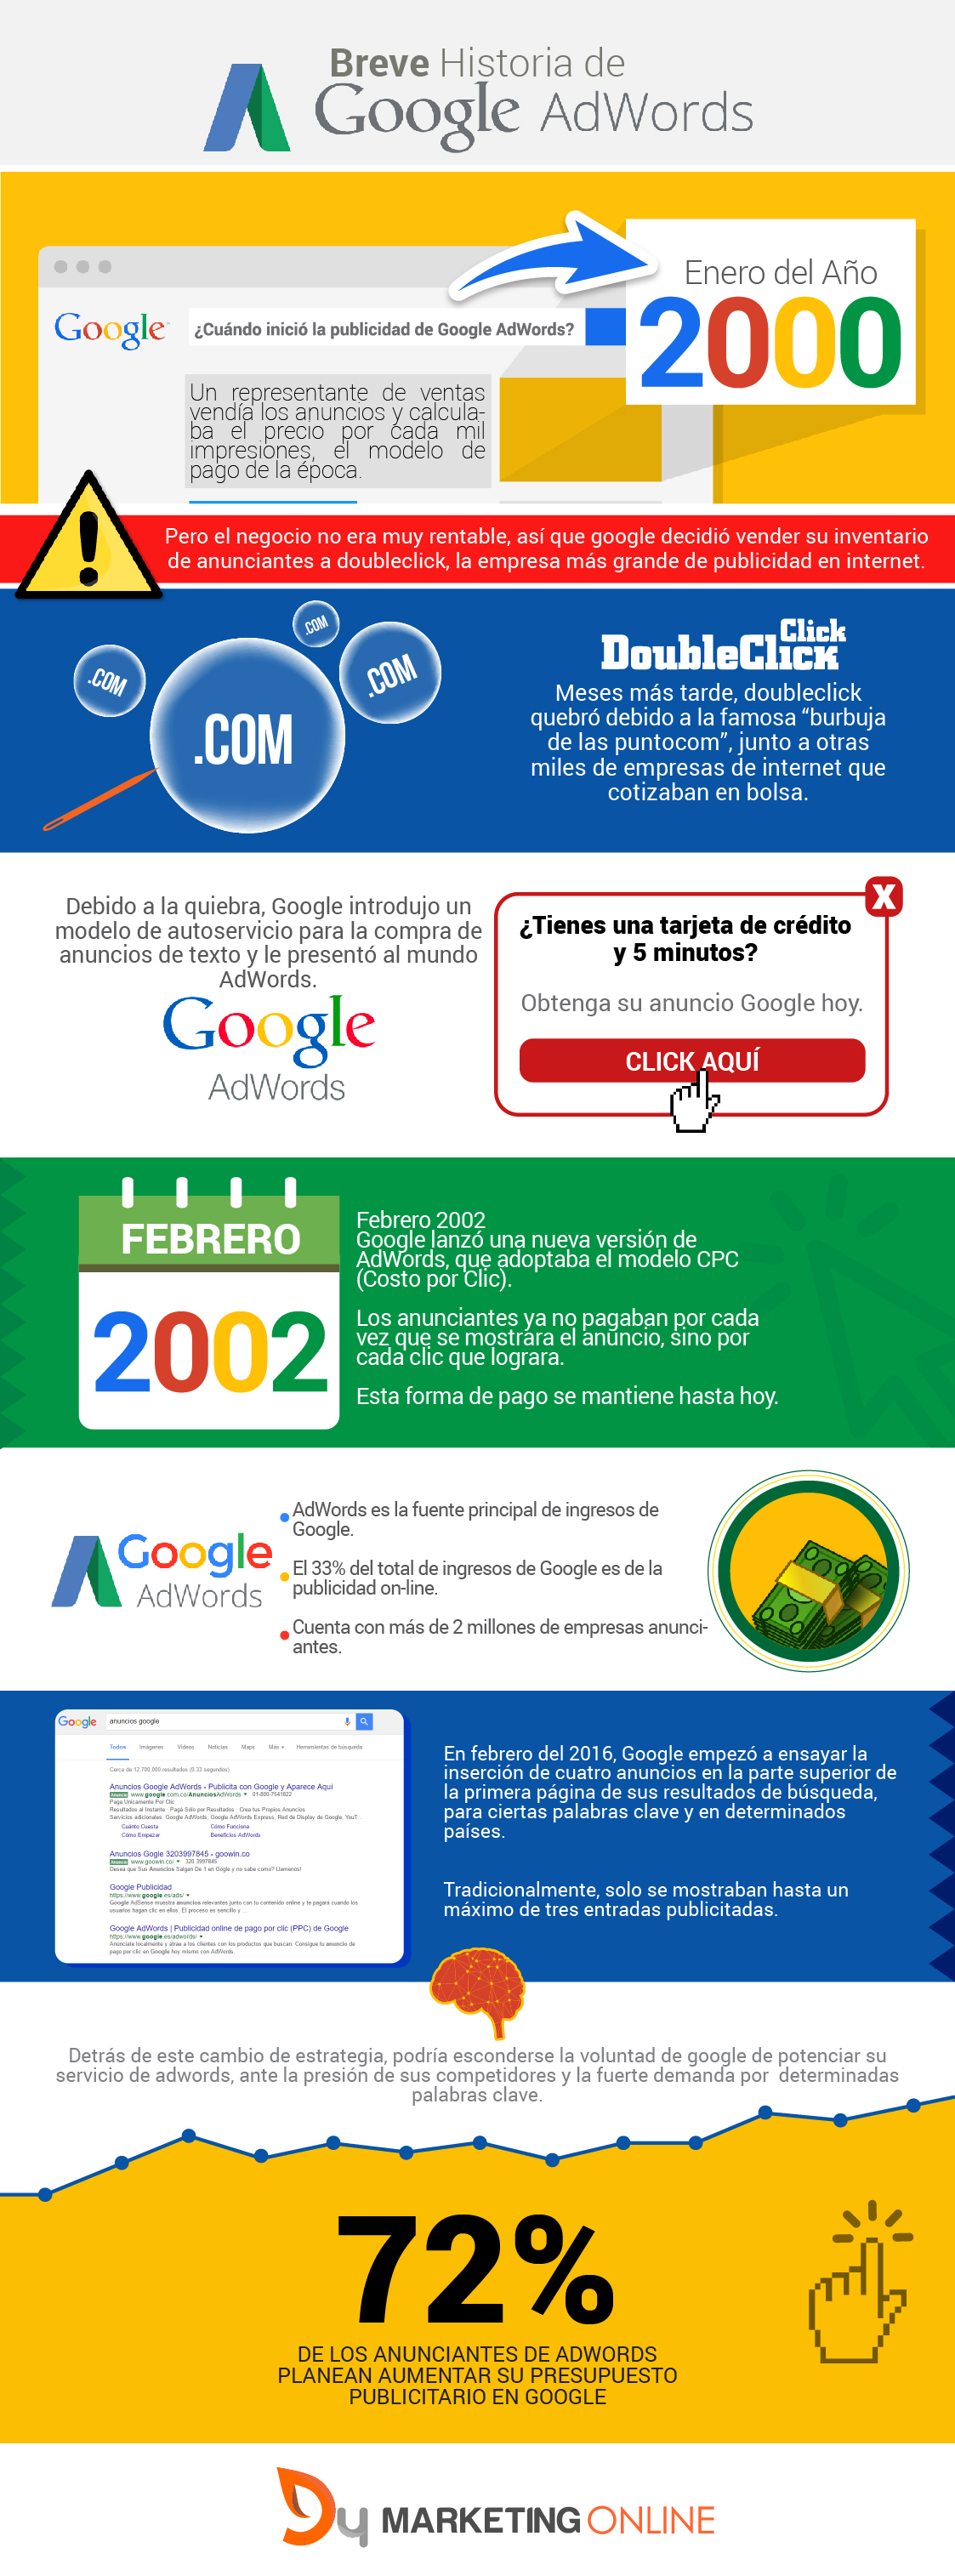 Breve historia de Google AdWords